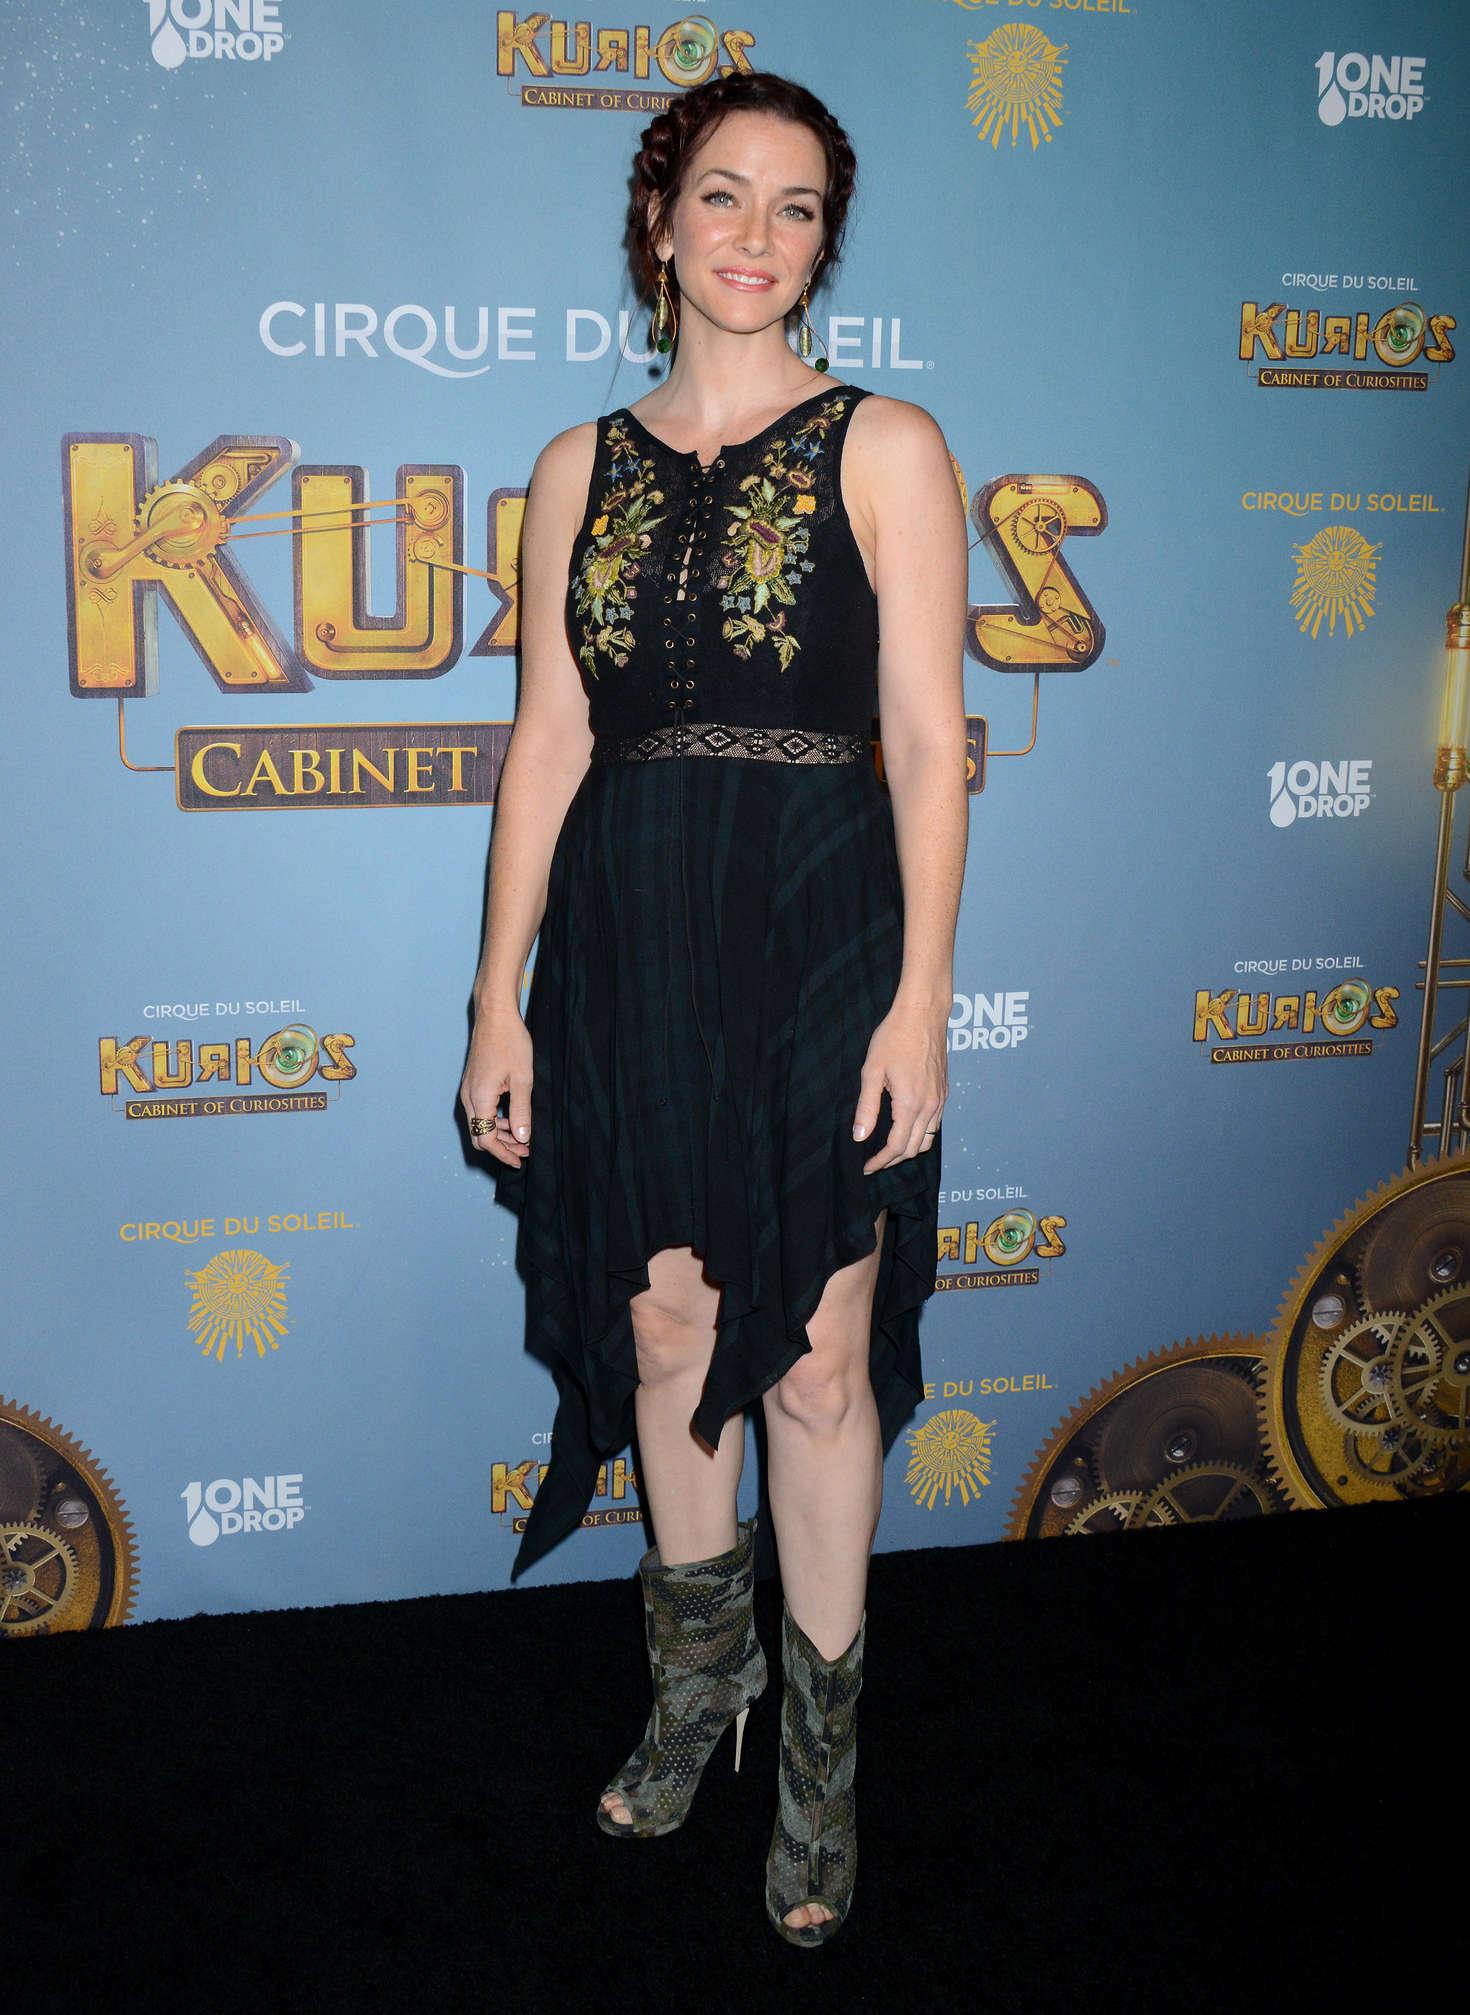 Annie Wersching Opening Night of Cirque Du Soleils Kurios-Cabinet Of Curiosities in Los Angeles